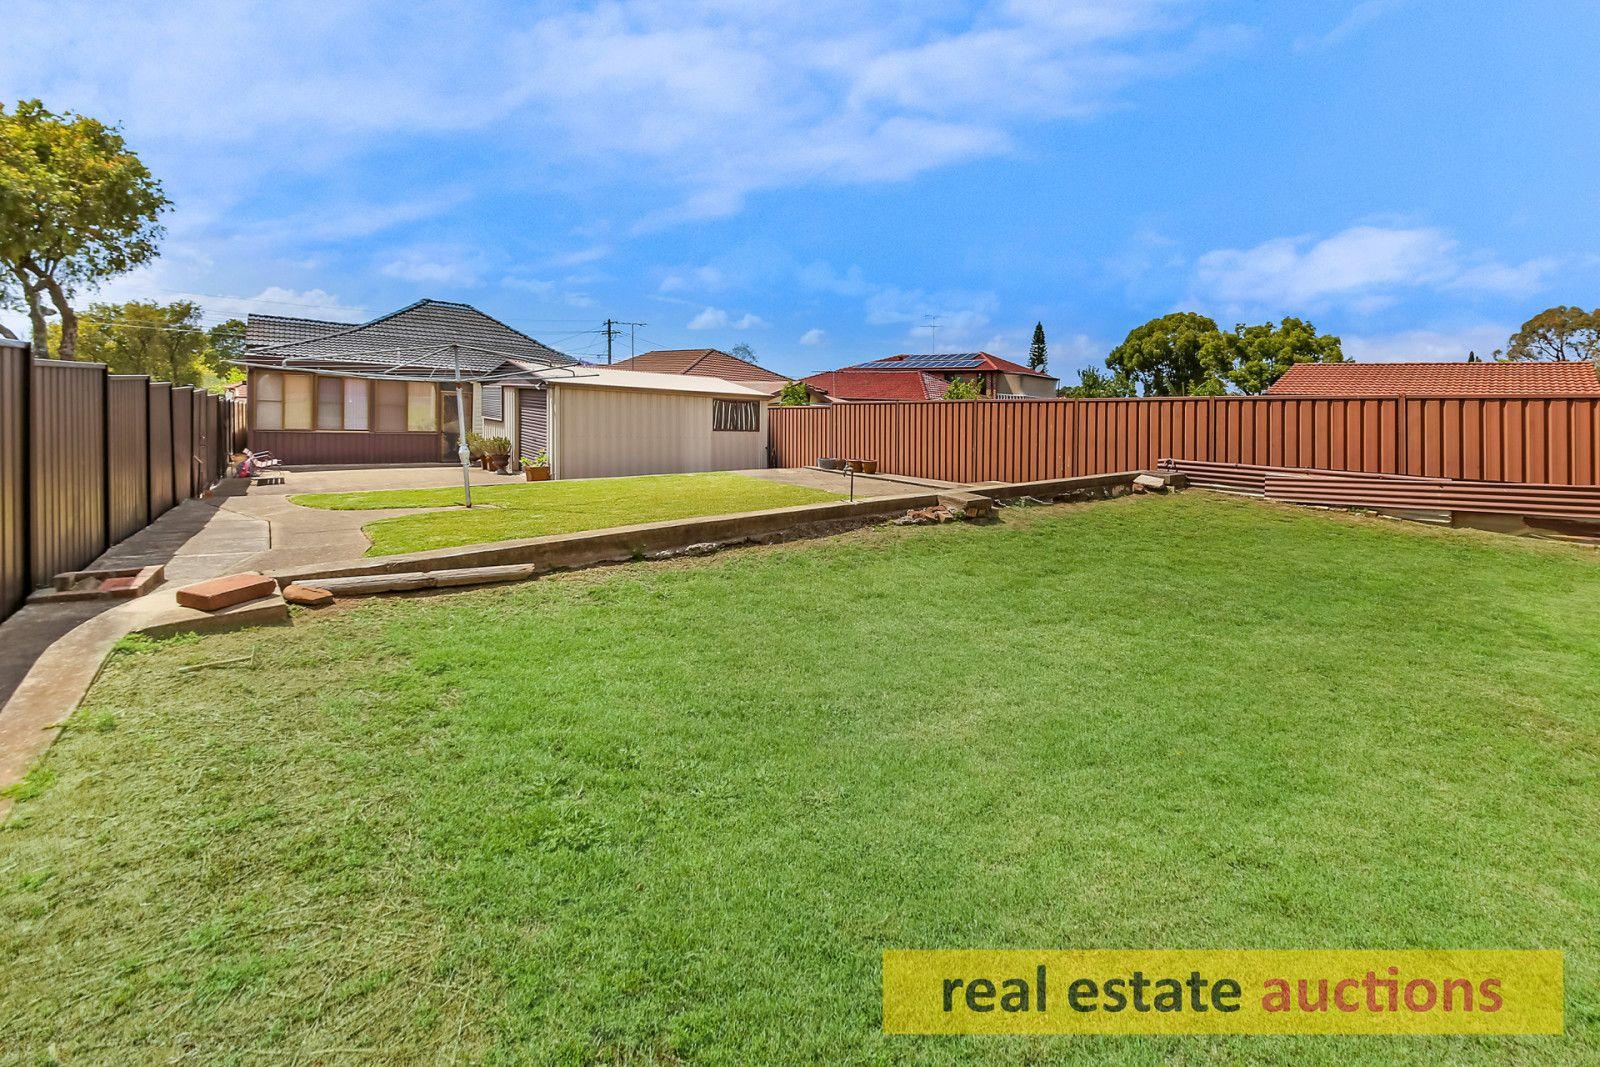 96 DUDLEY STREET, Berala NSW 2141, Image 1